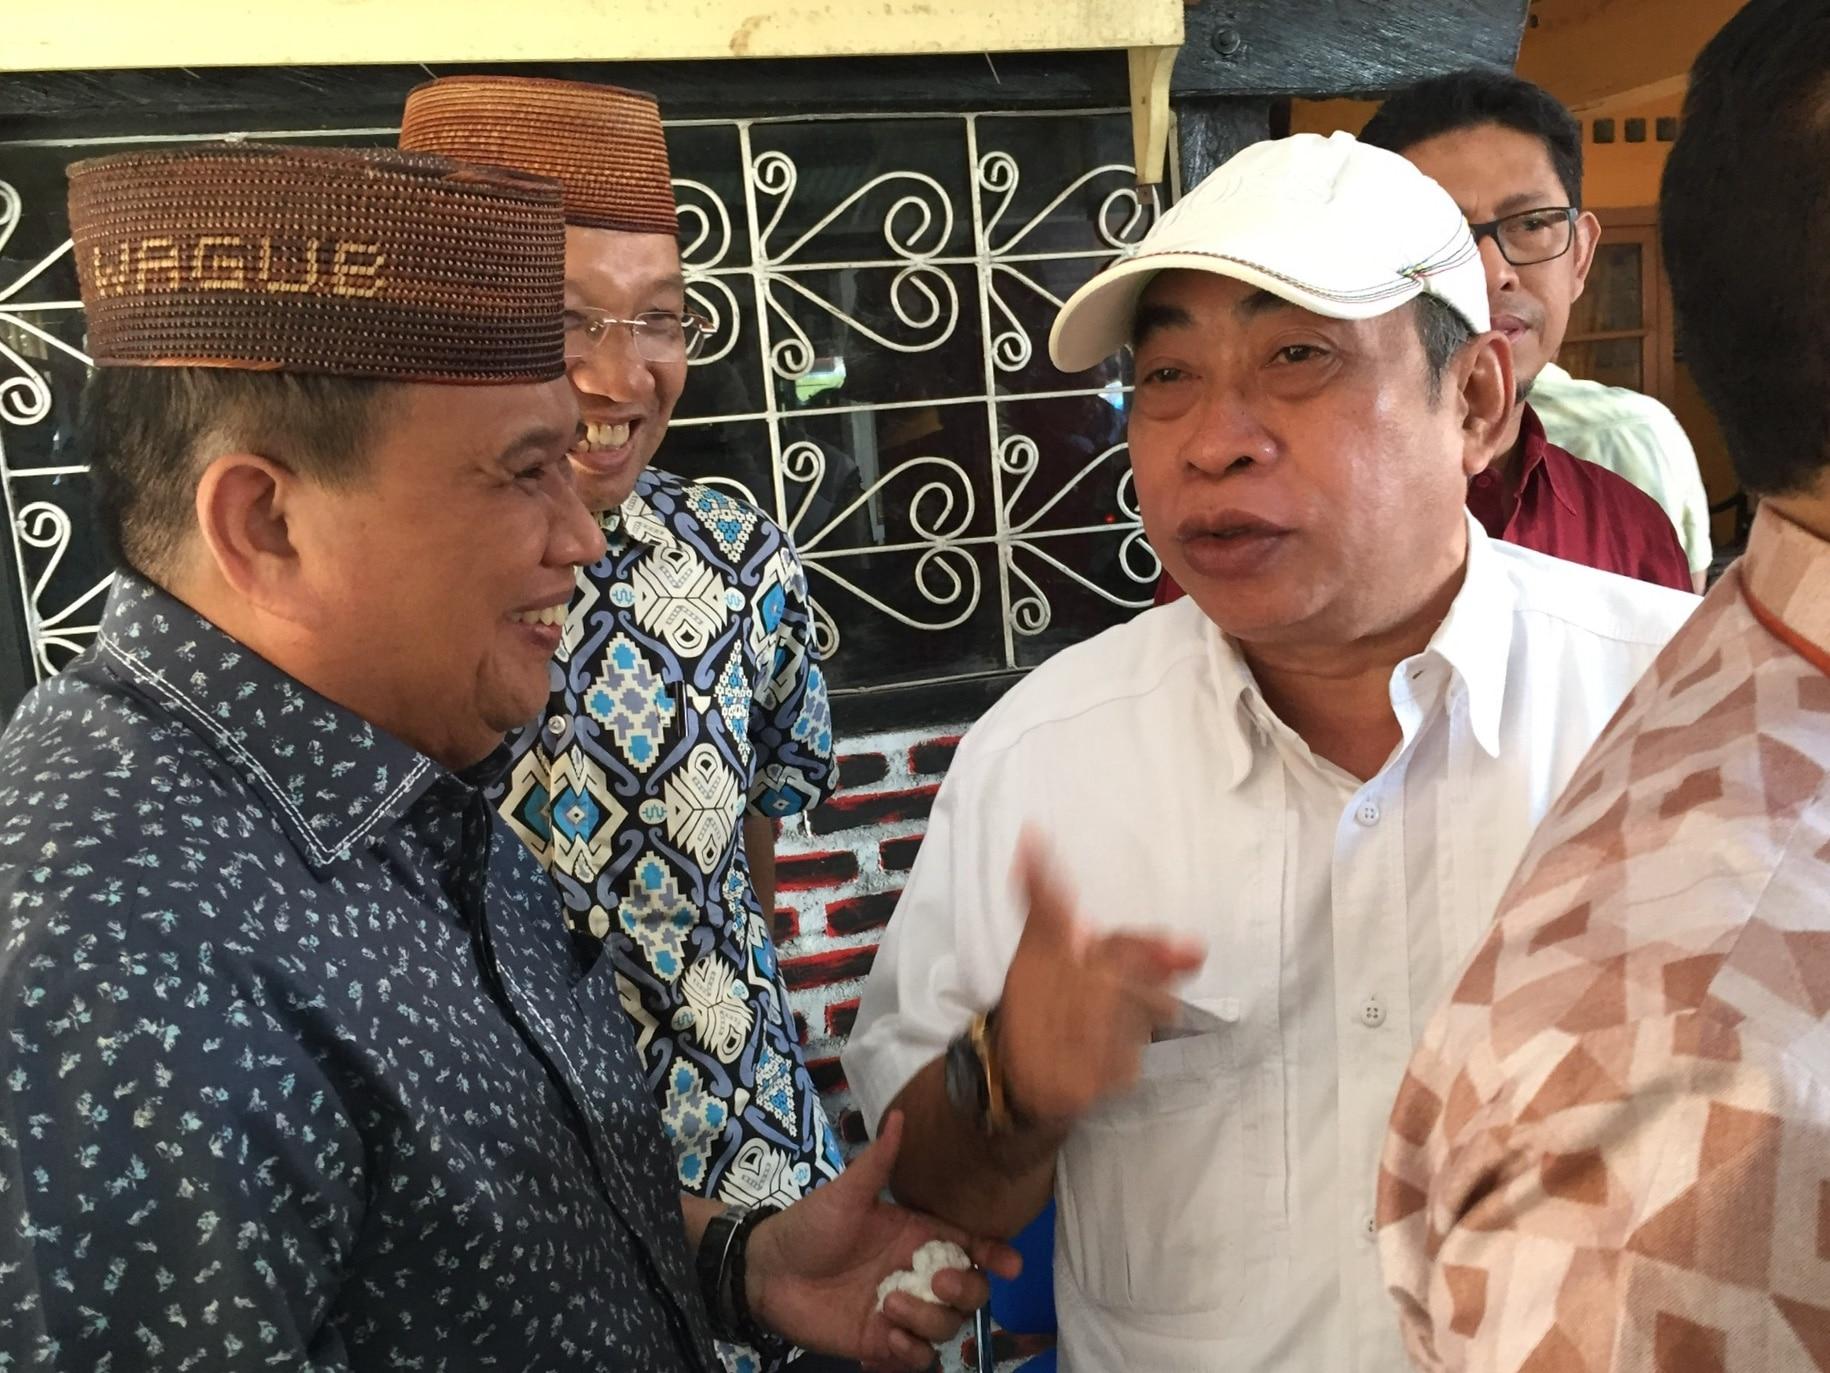 Wakil Gubernur Gorotalo Idris Rahim bersama Anggota DPRD Provinsi Gorontalo Adhan Dambe saat berbincang-bincang usai dialog warung kopi.